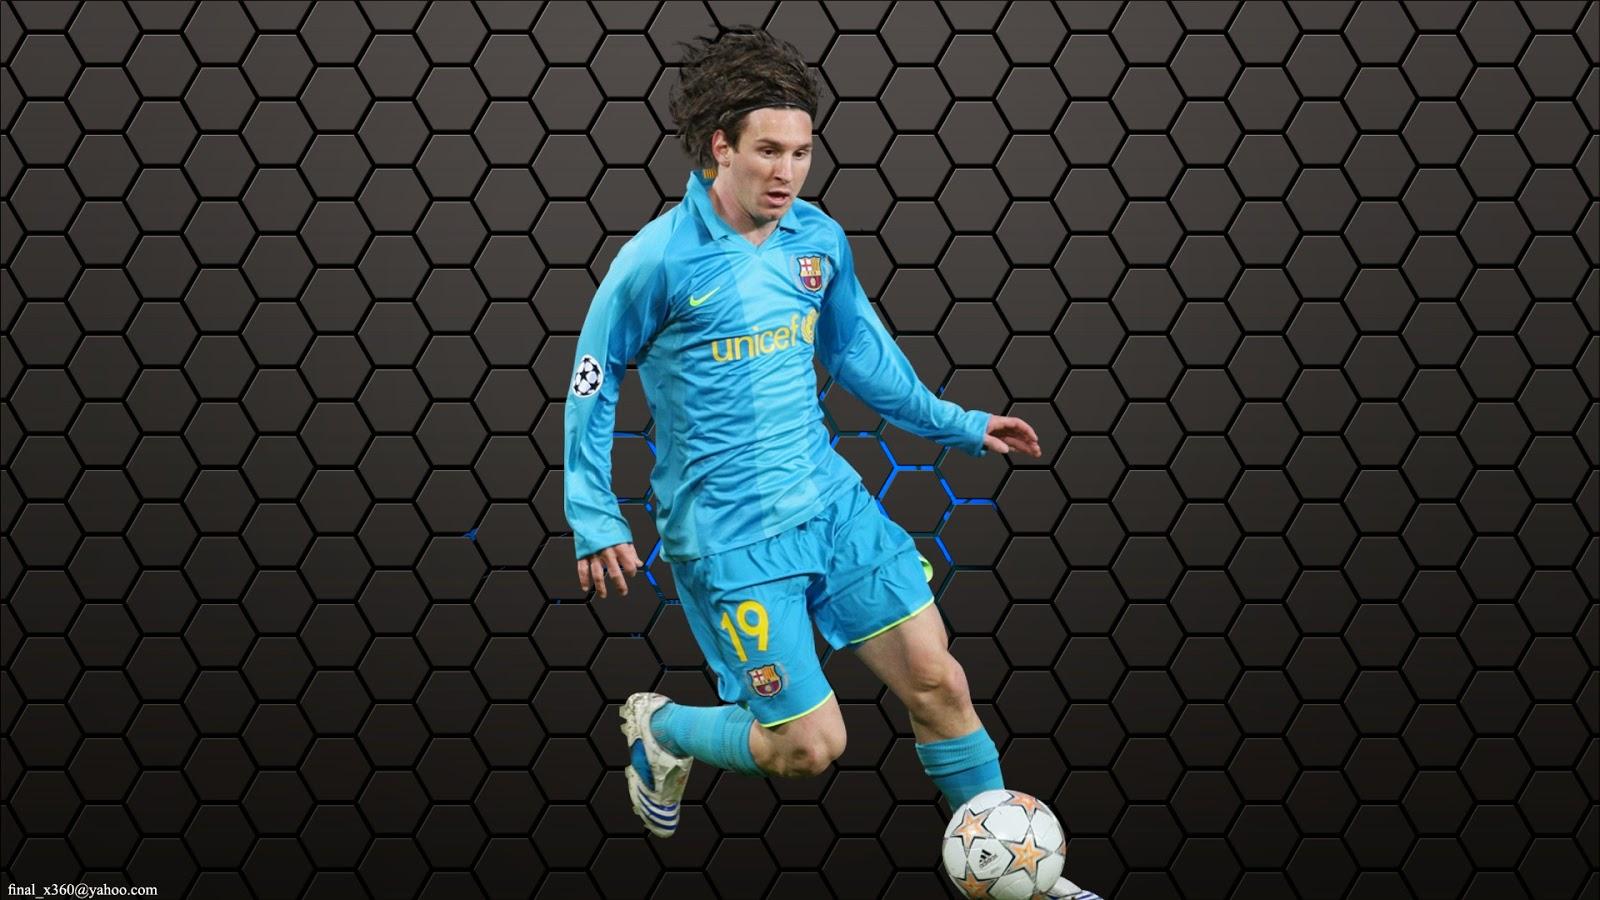 Hrithik Roshan Car Wallpaper Coogled Lionel Messi Fc Barcelona Argentina Hd Wallpapers